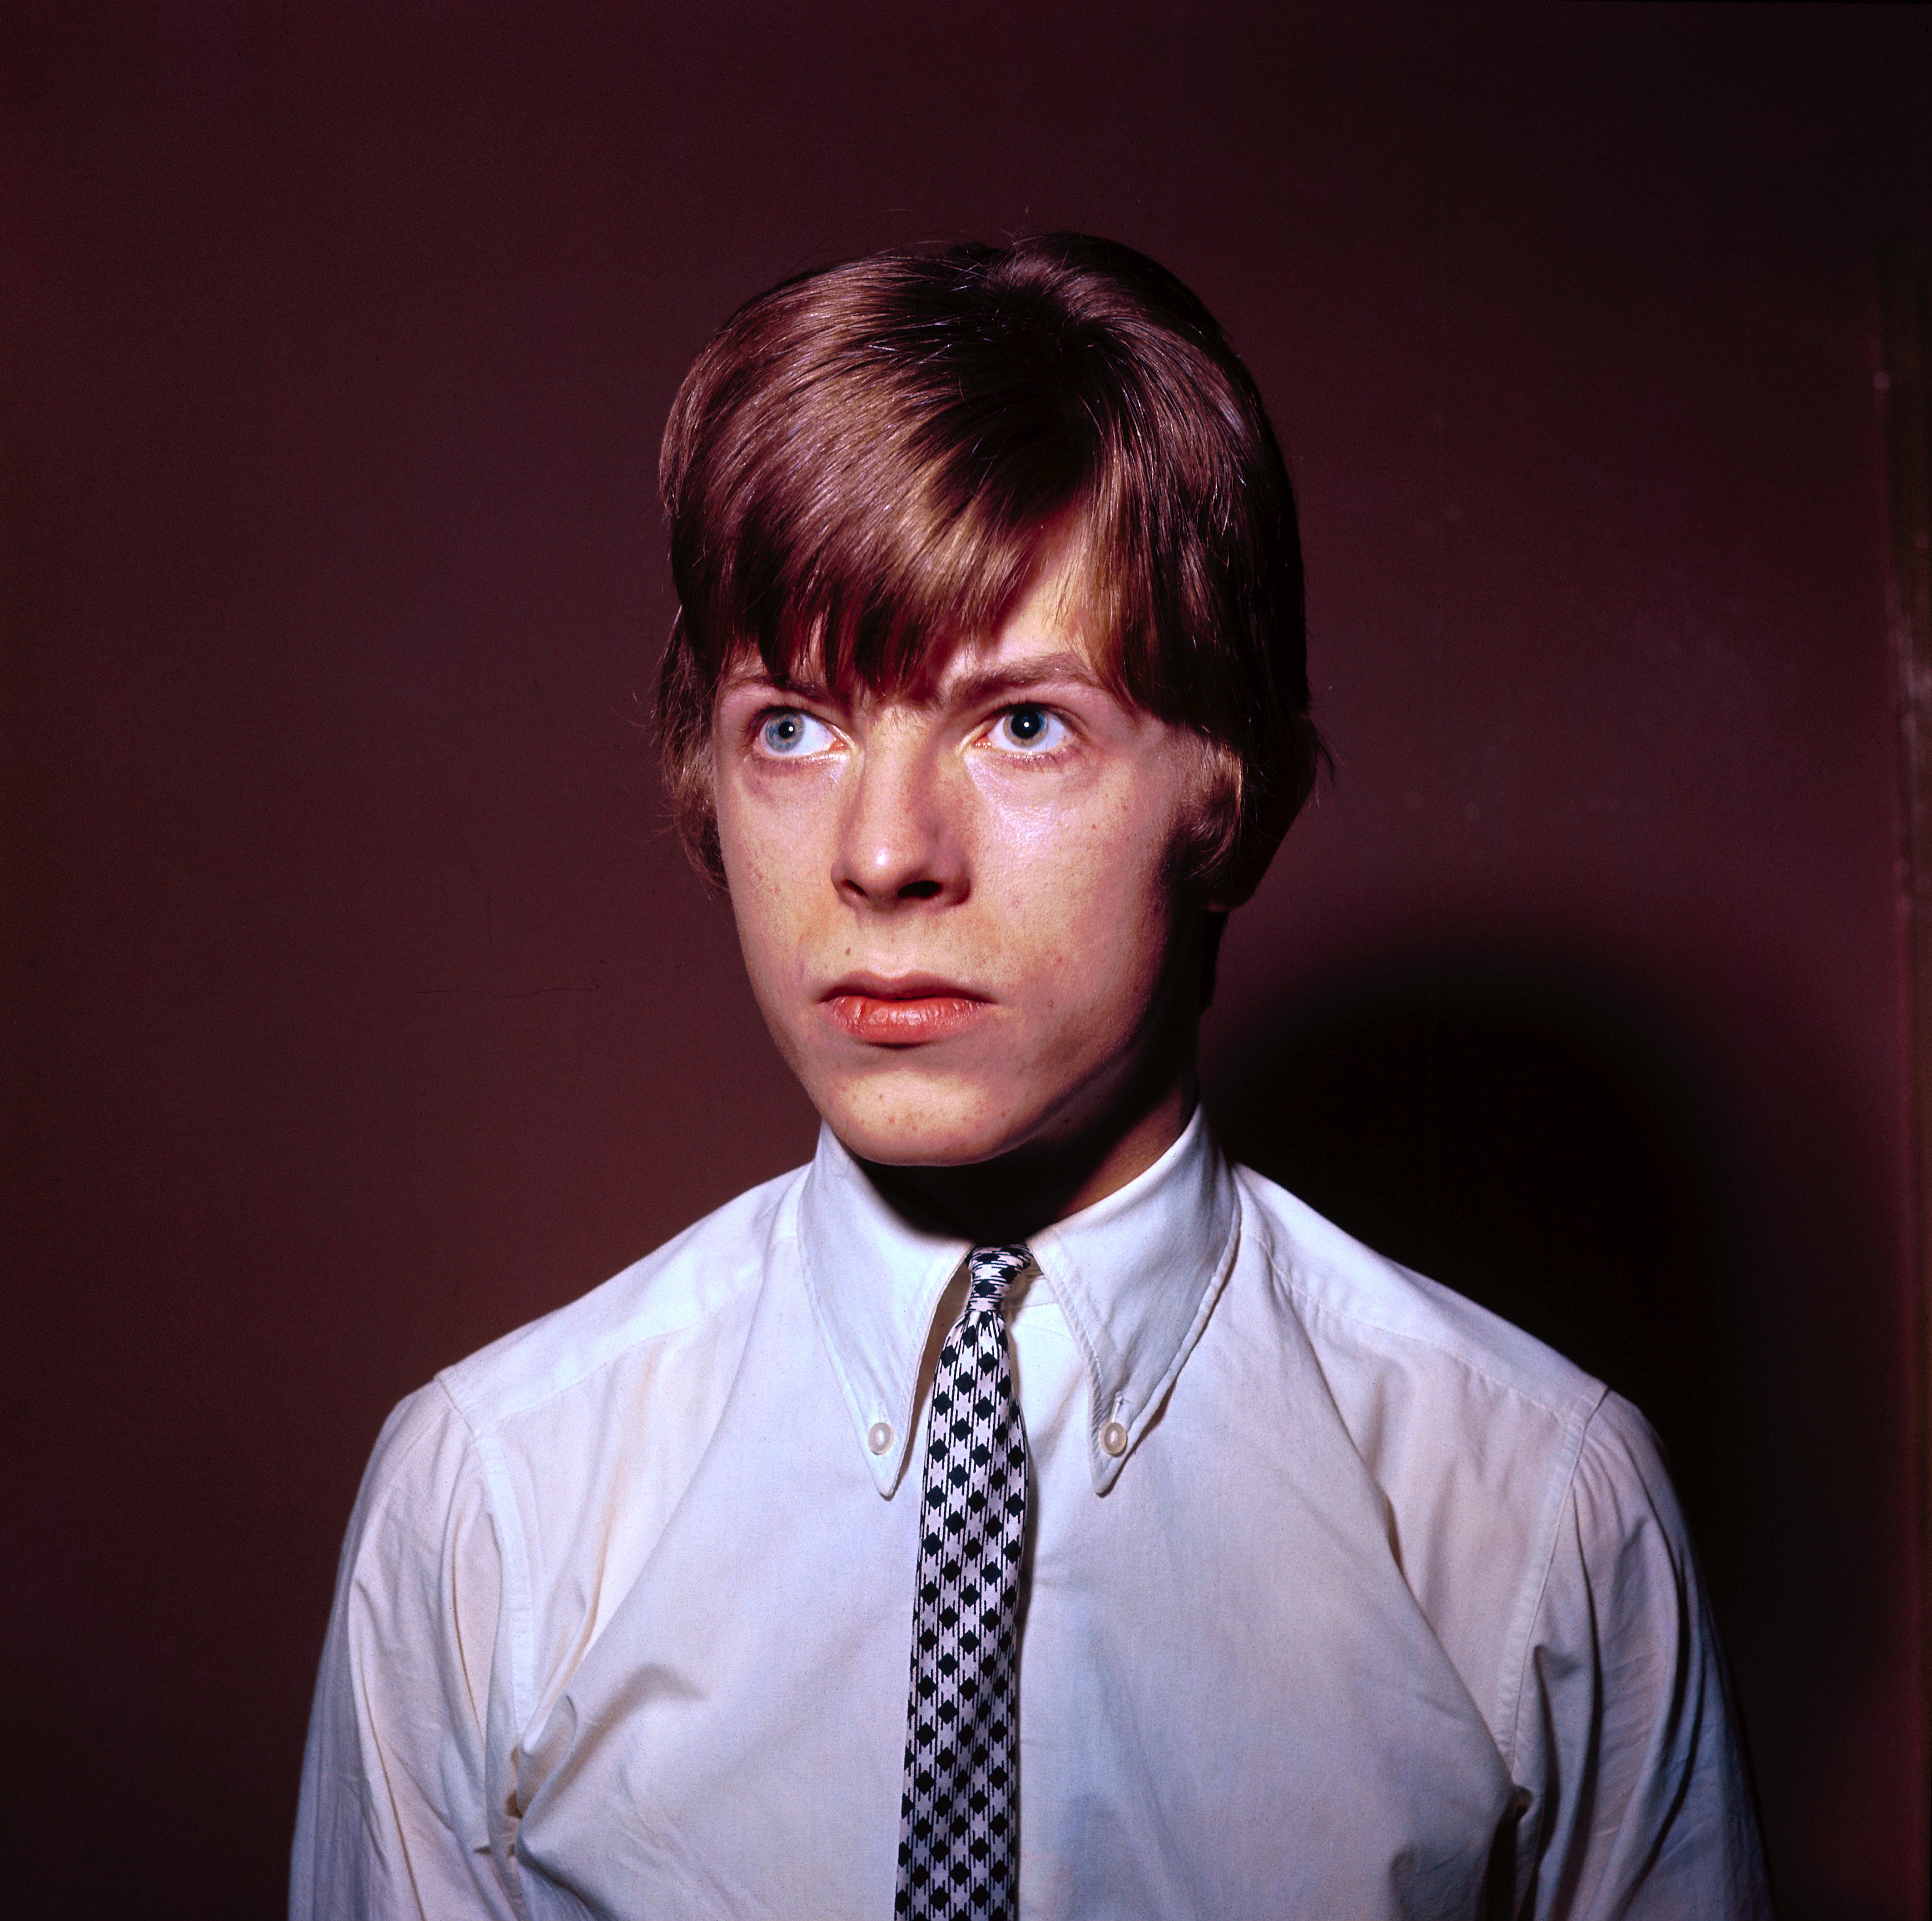 David Bowie is seen c. 1965.